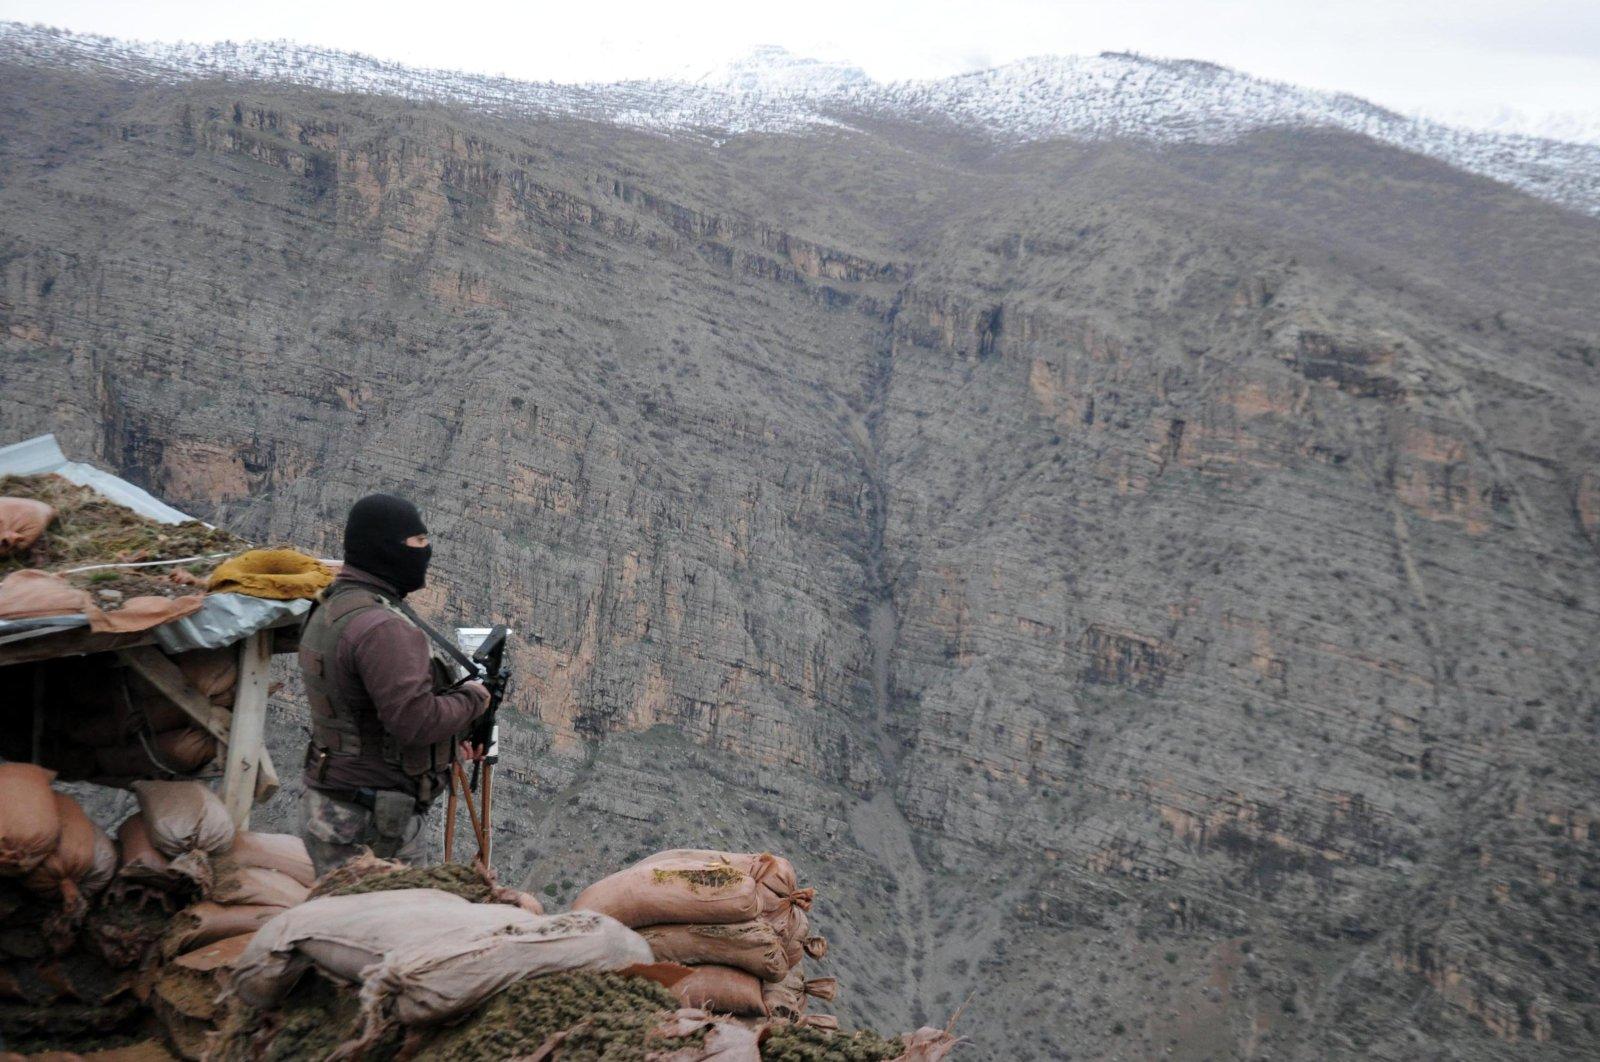 A Turkish soldier stands on guard in the Çukurca district in Turkey's Hakkari province near the Iraqi border. (AA File Photo)